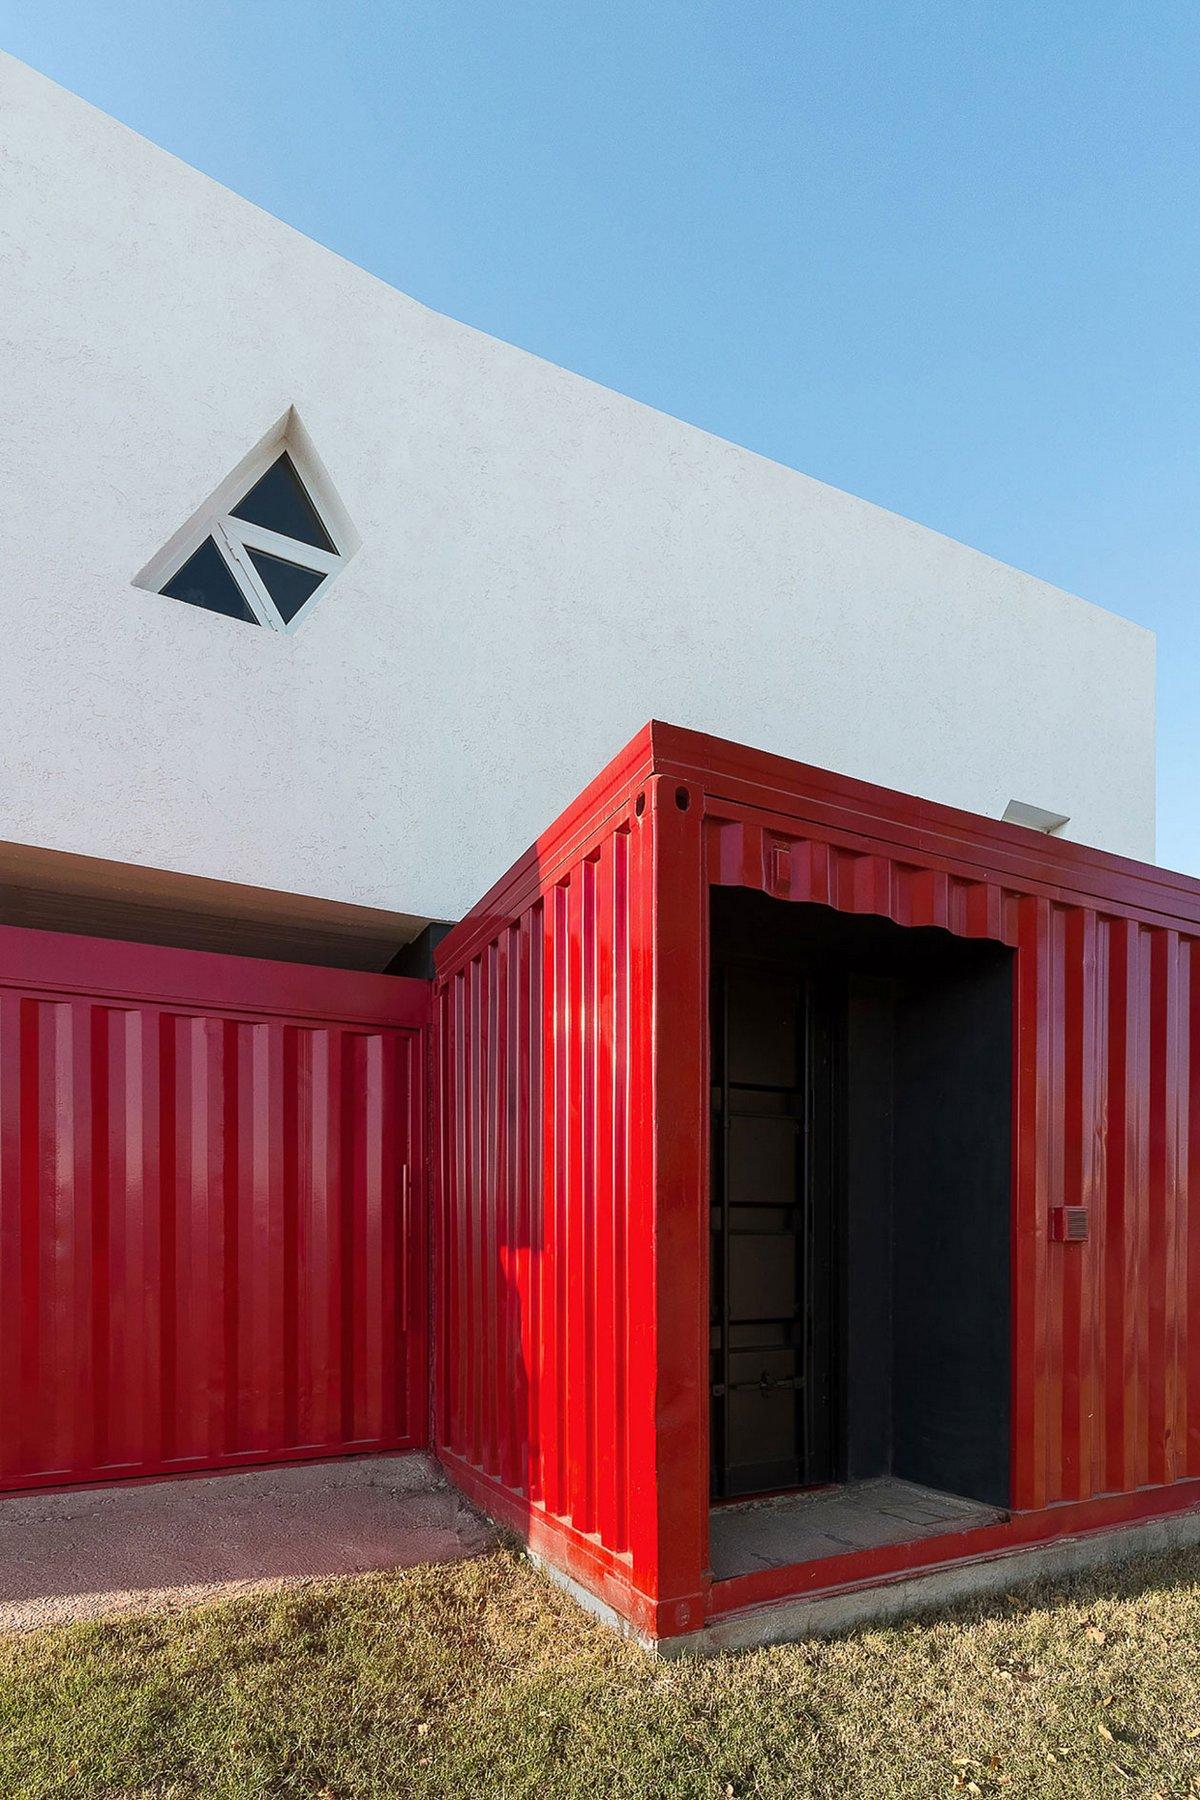 Jose Schreiber Arquitecto, Container House, частный дом в Аргентине обзор, дома из морских контейнеров, дом из контейнеров, частные дома в Аргентине